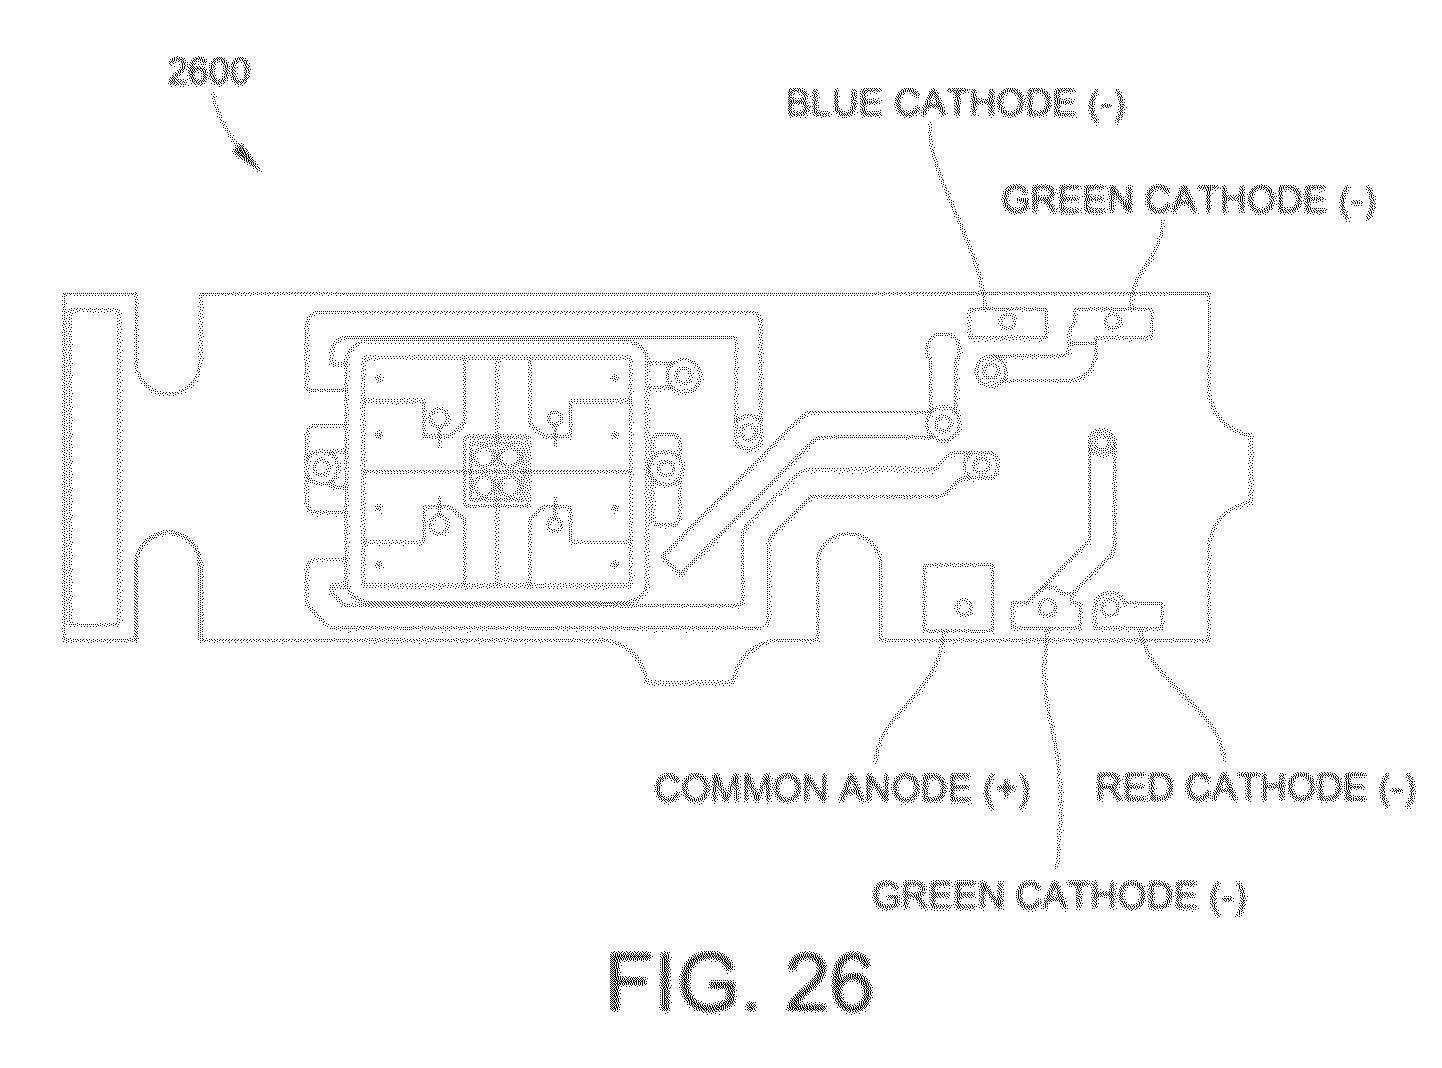 Patent US 9,129,295 B2 on